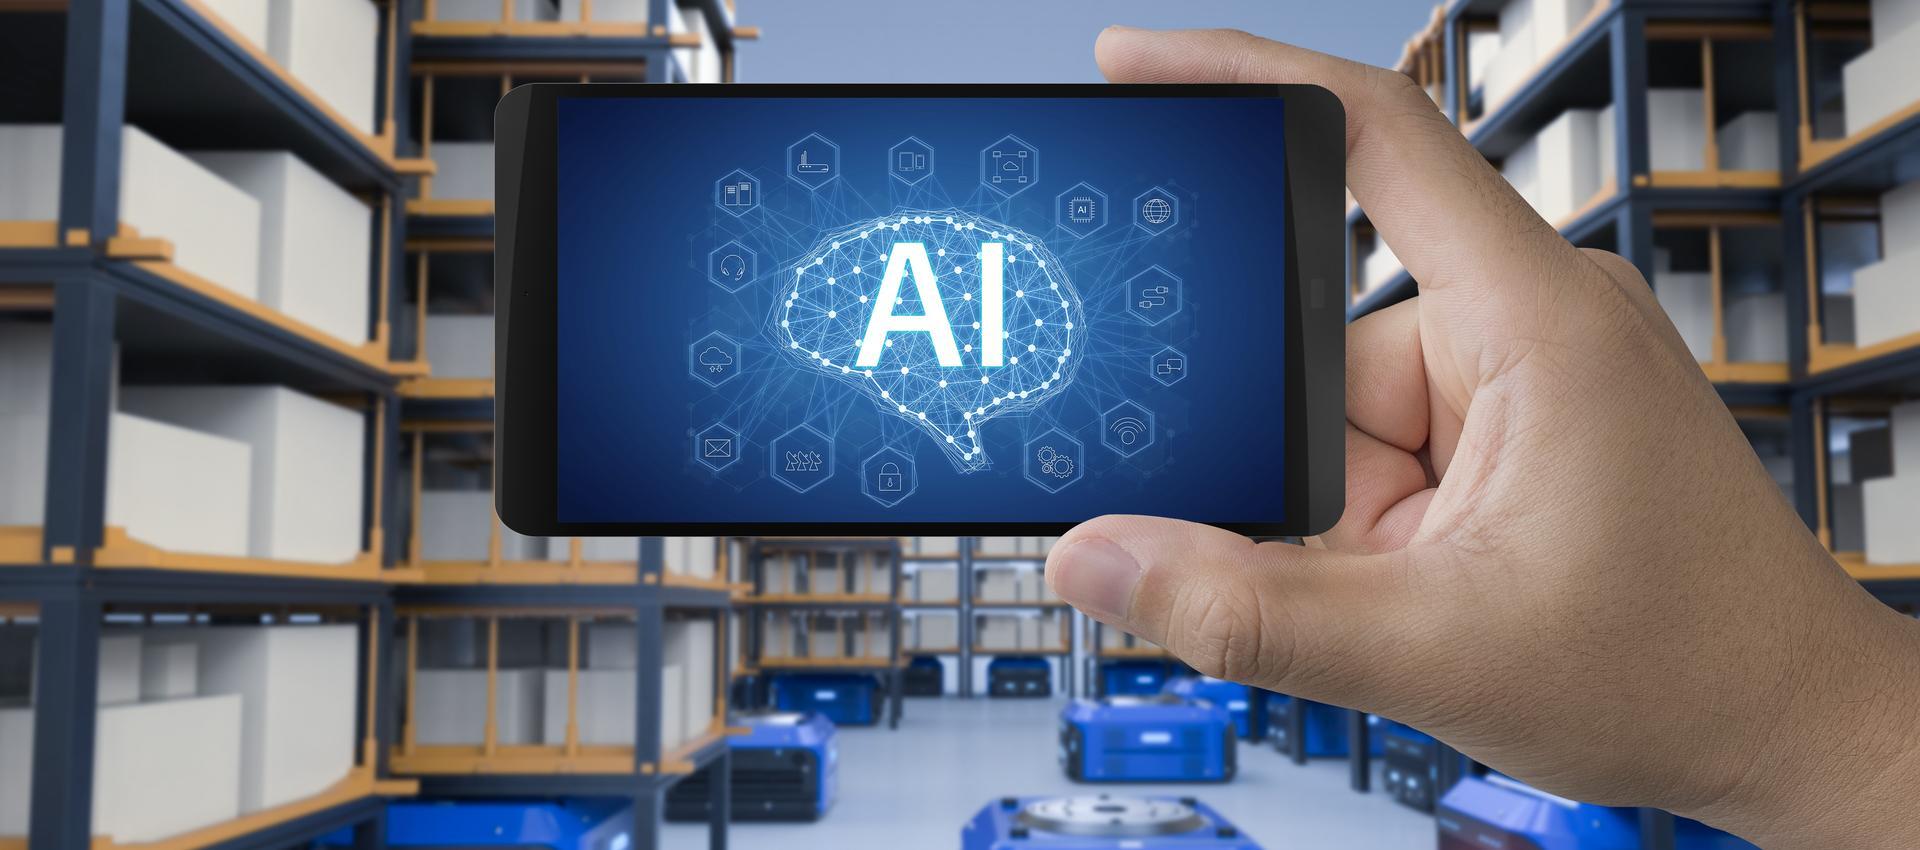 Warehouse Technology: Artificial Intelligence (AI)